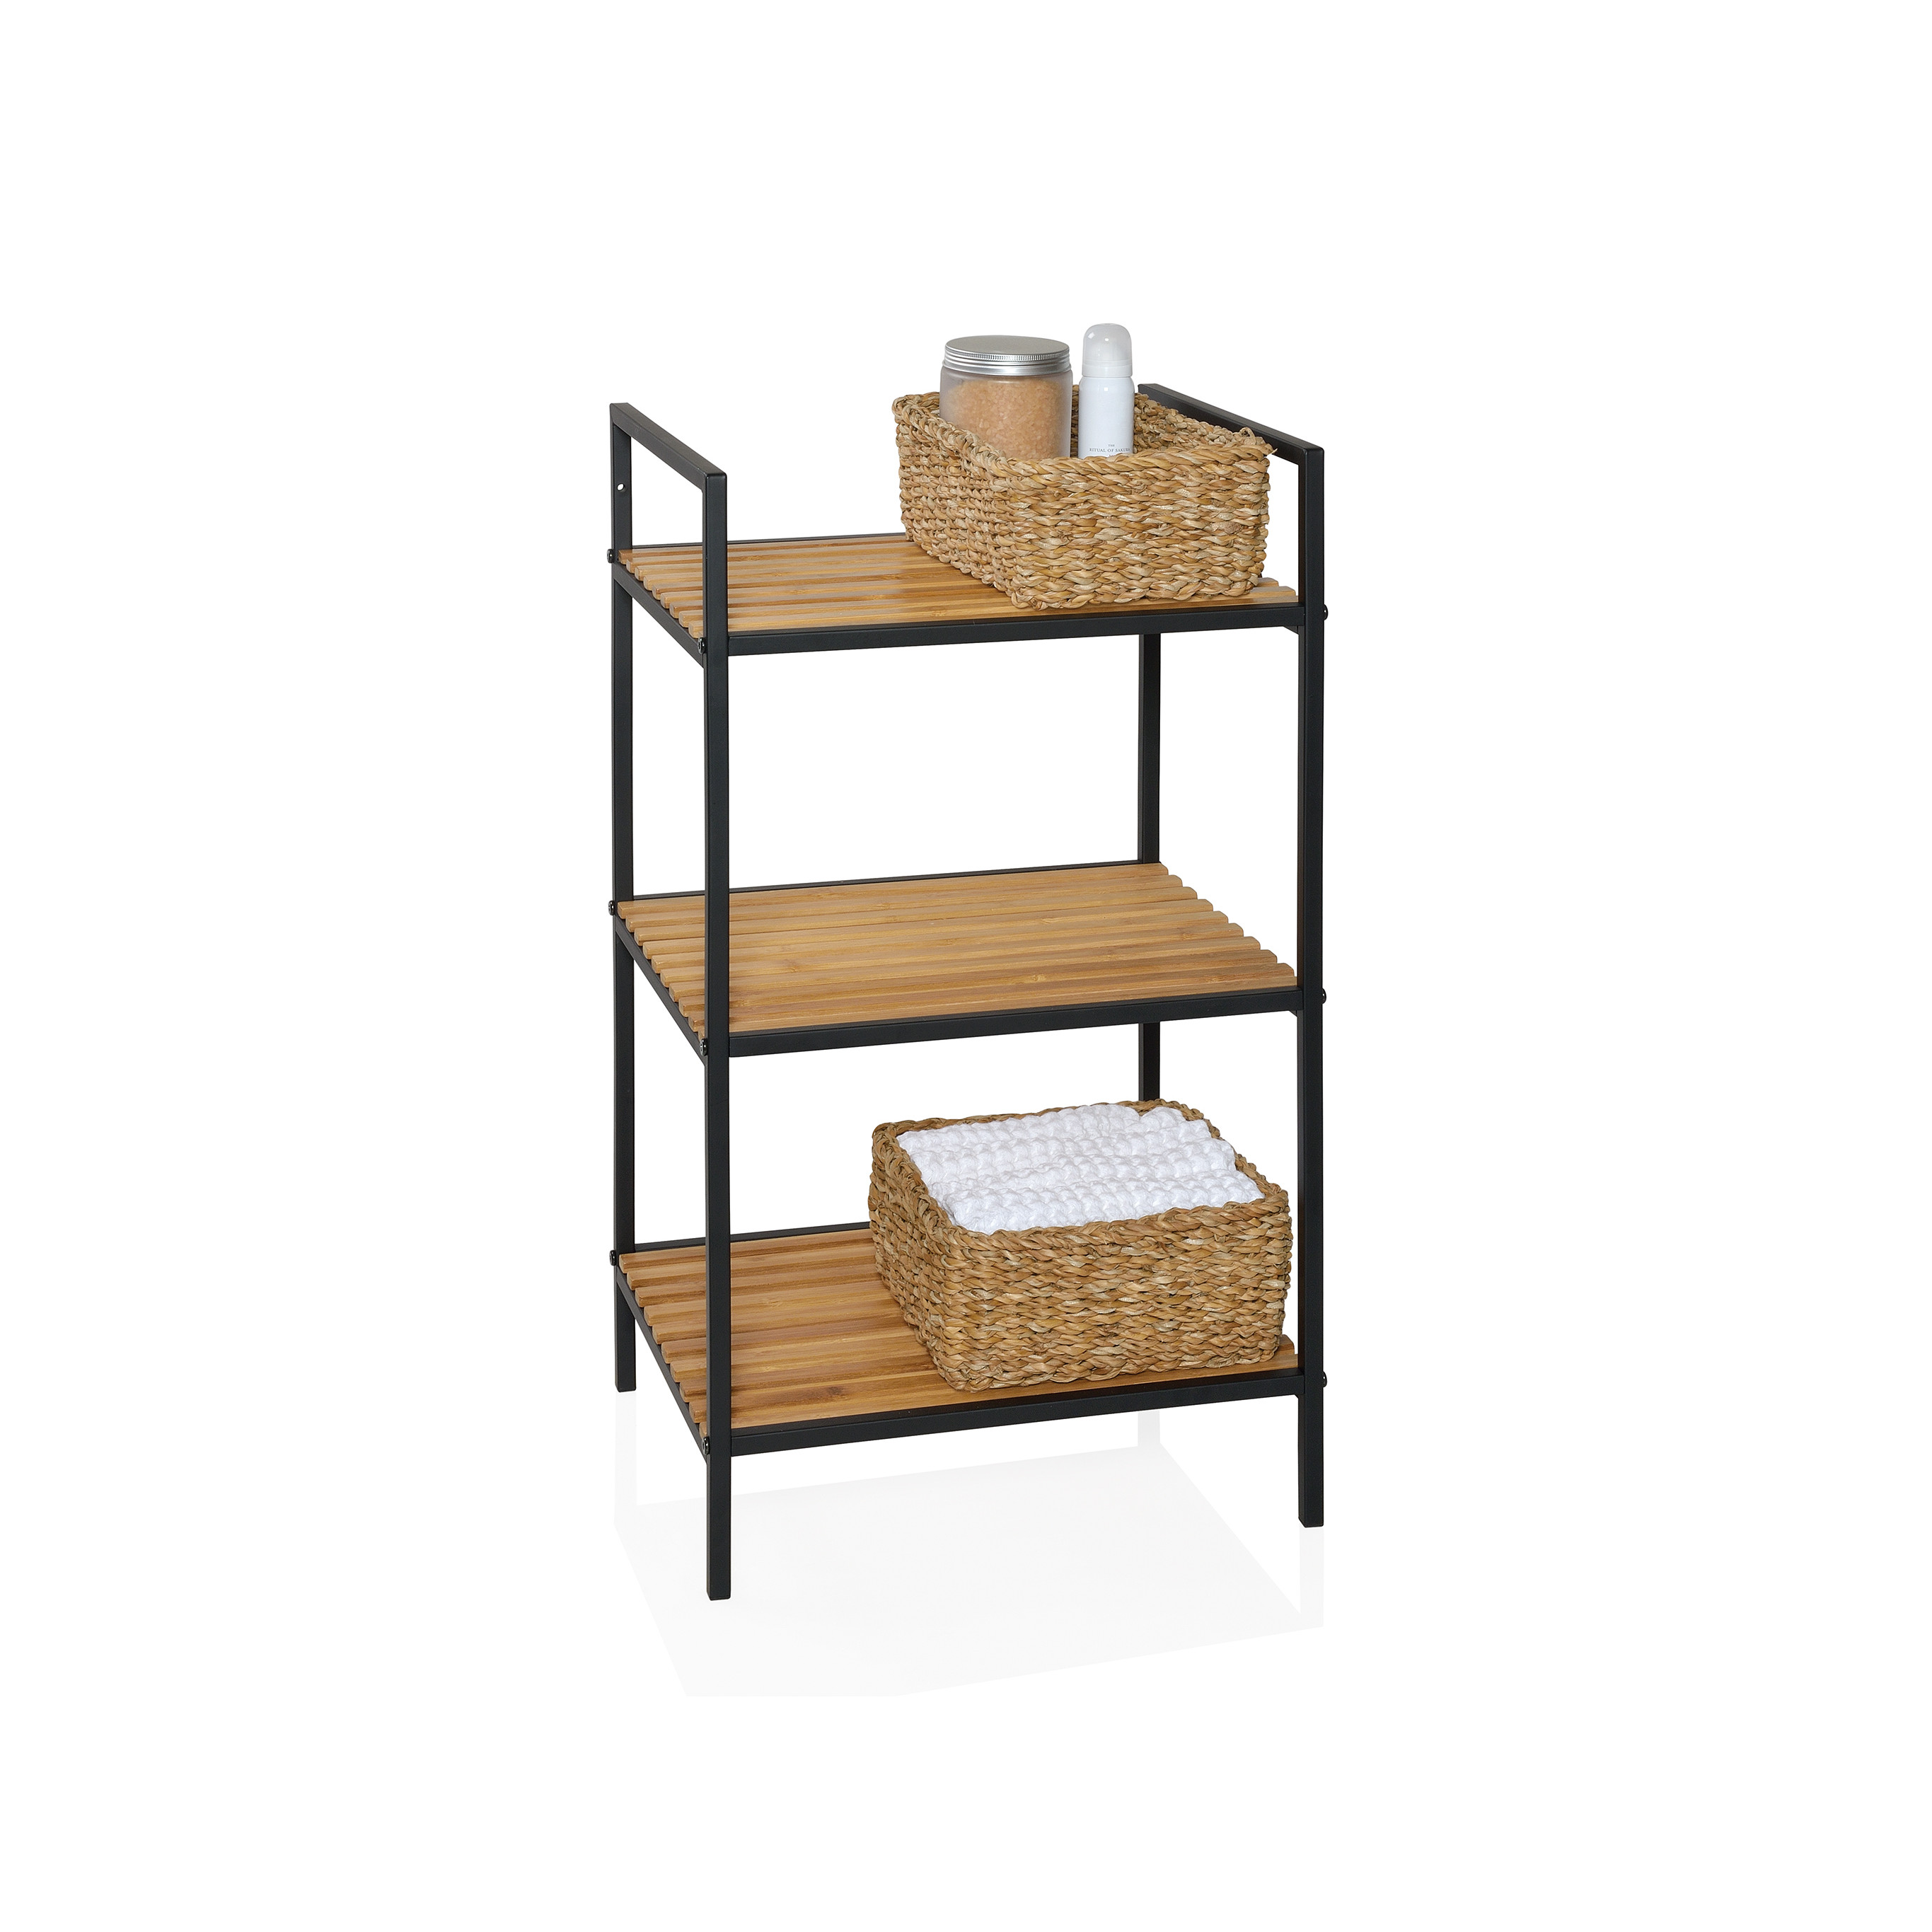 Shelf with 3 Shelves | Black/Bamboo